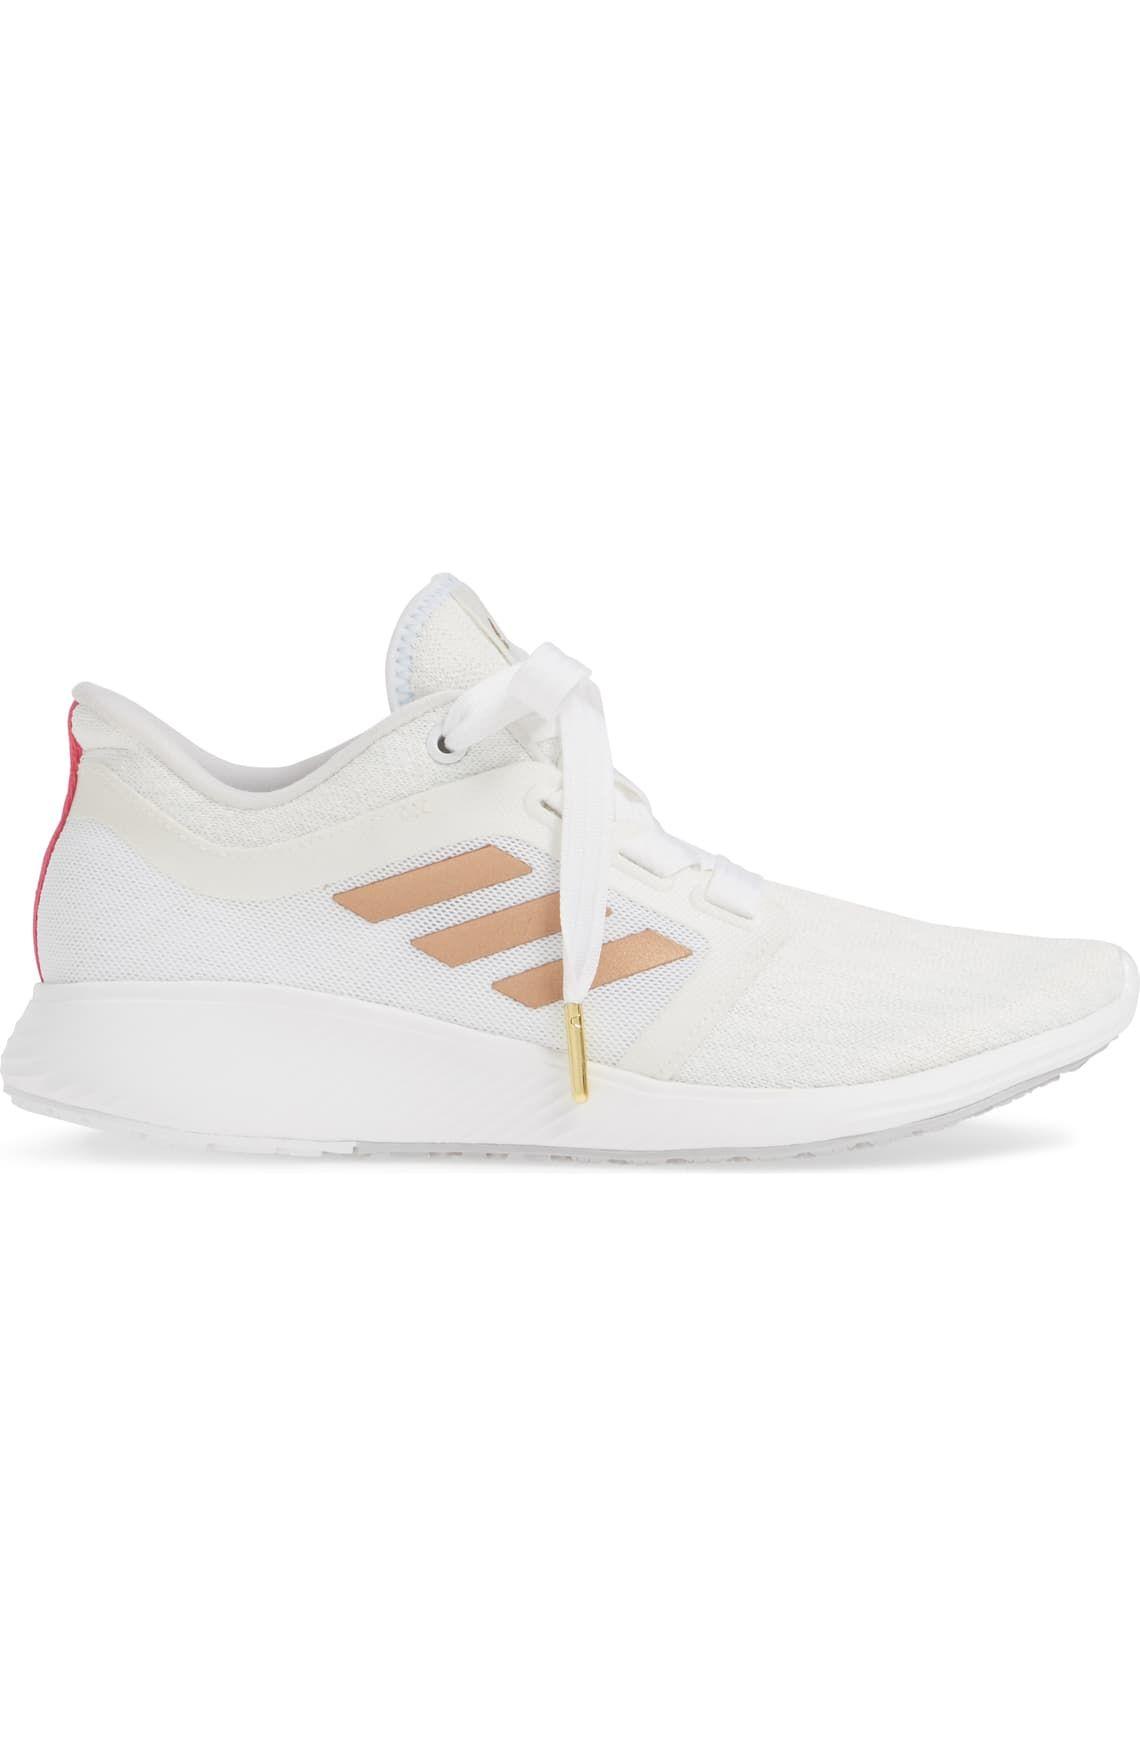 adidas Edge Lux 3 Running Shoe (Women